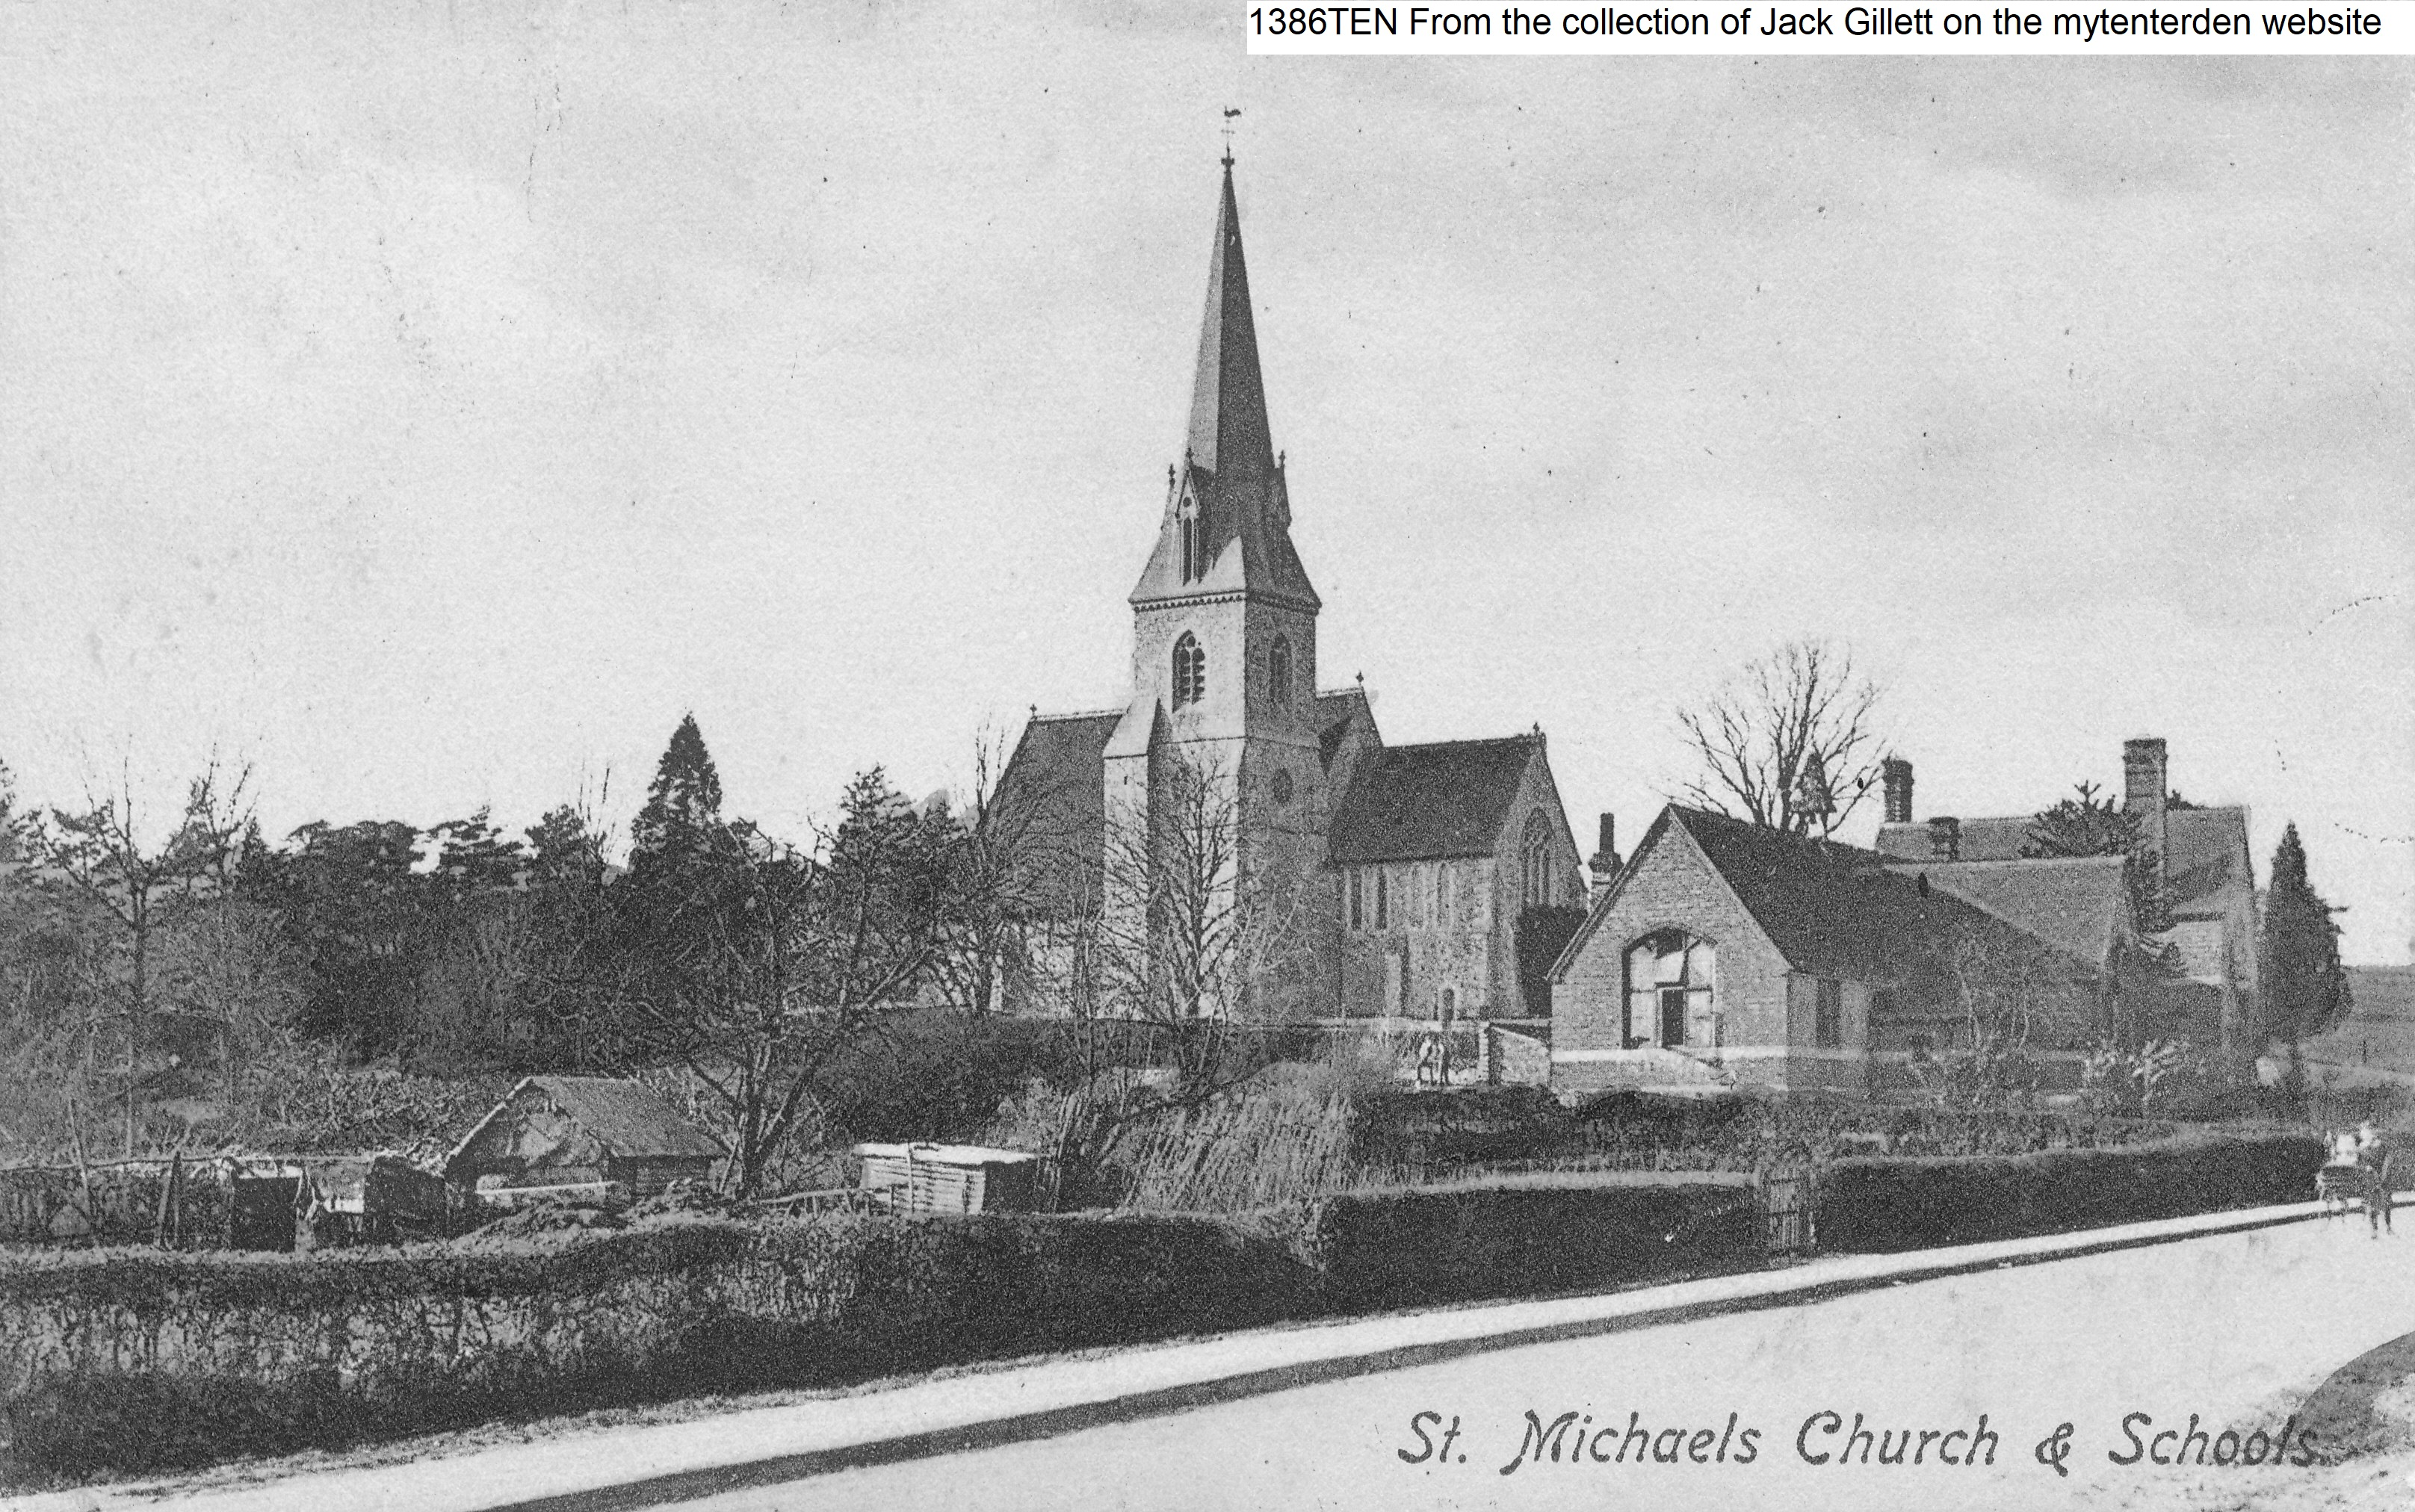 St Michaels Church & Schools